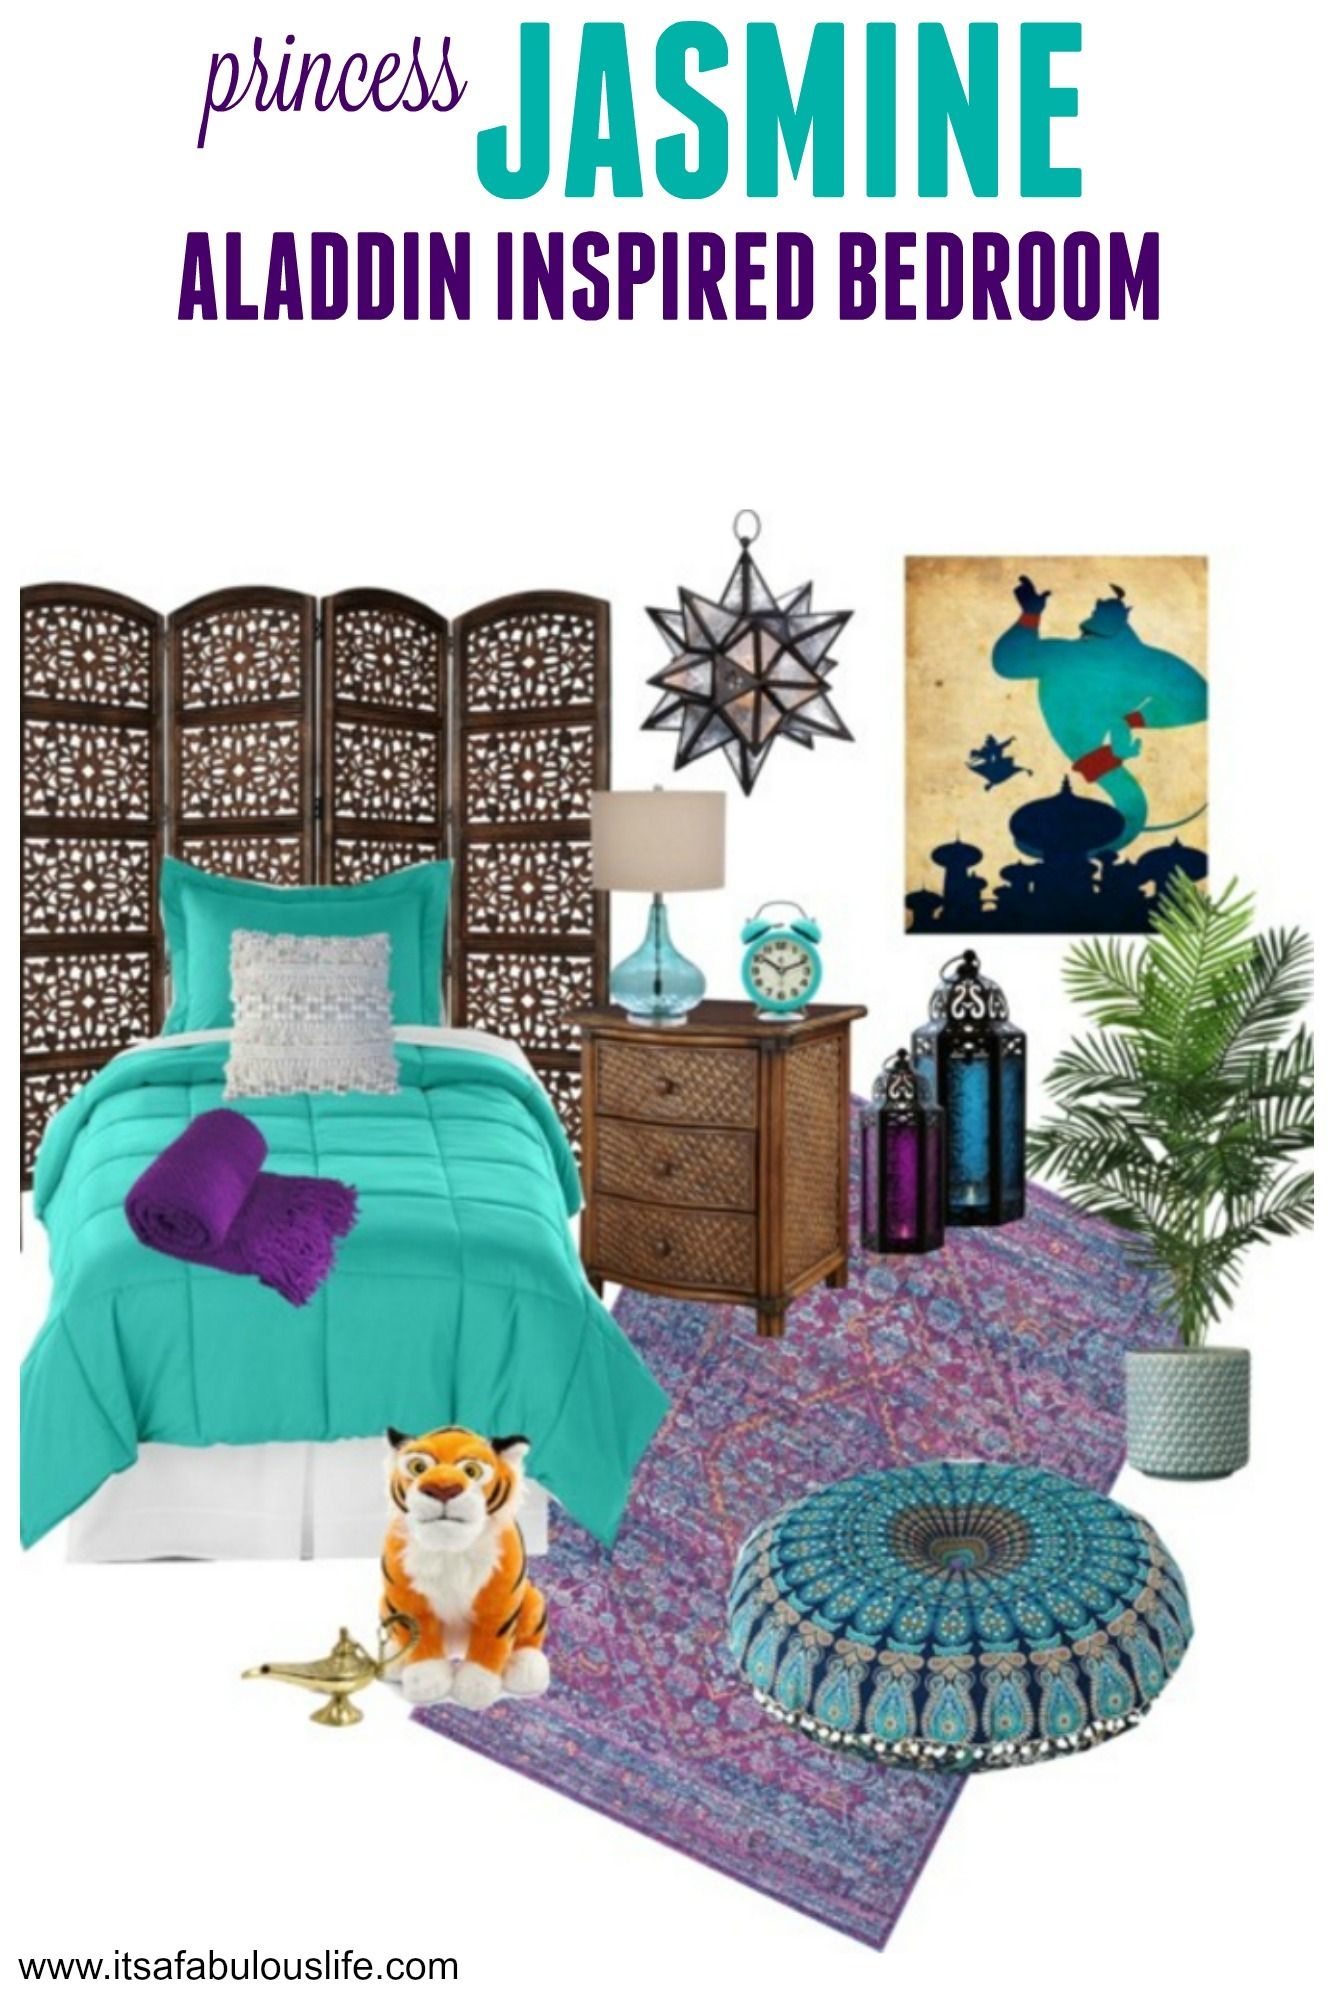 Disney Princess Bedroom Decorating Ideas With Images Disney Princess Bedroom Disney Bedrooms Princess Bedrooms